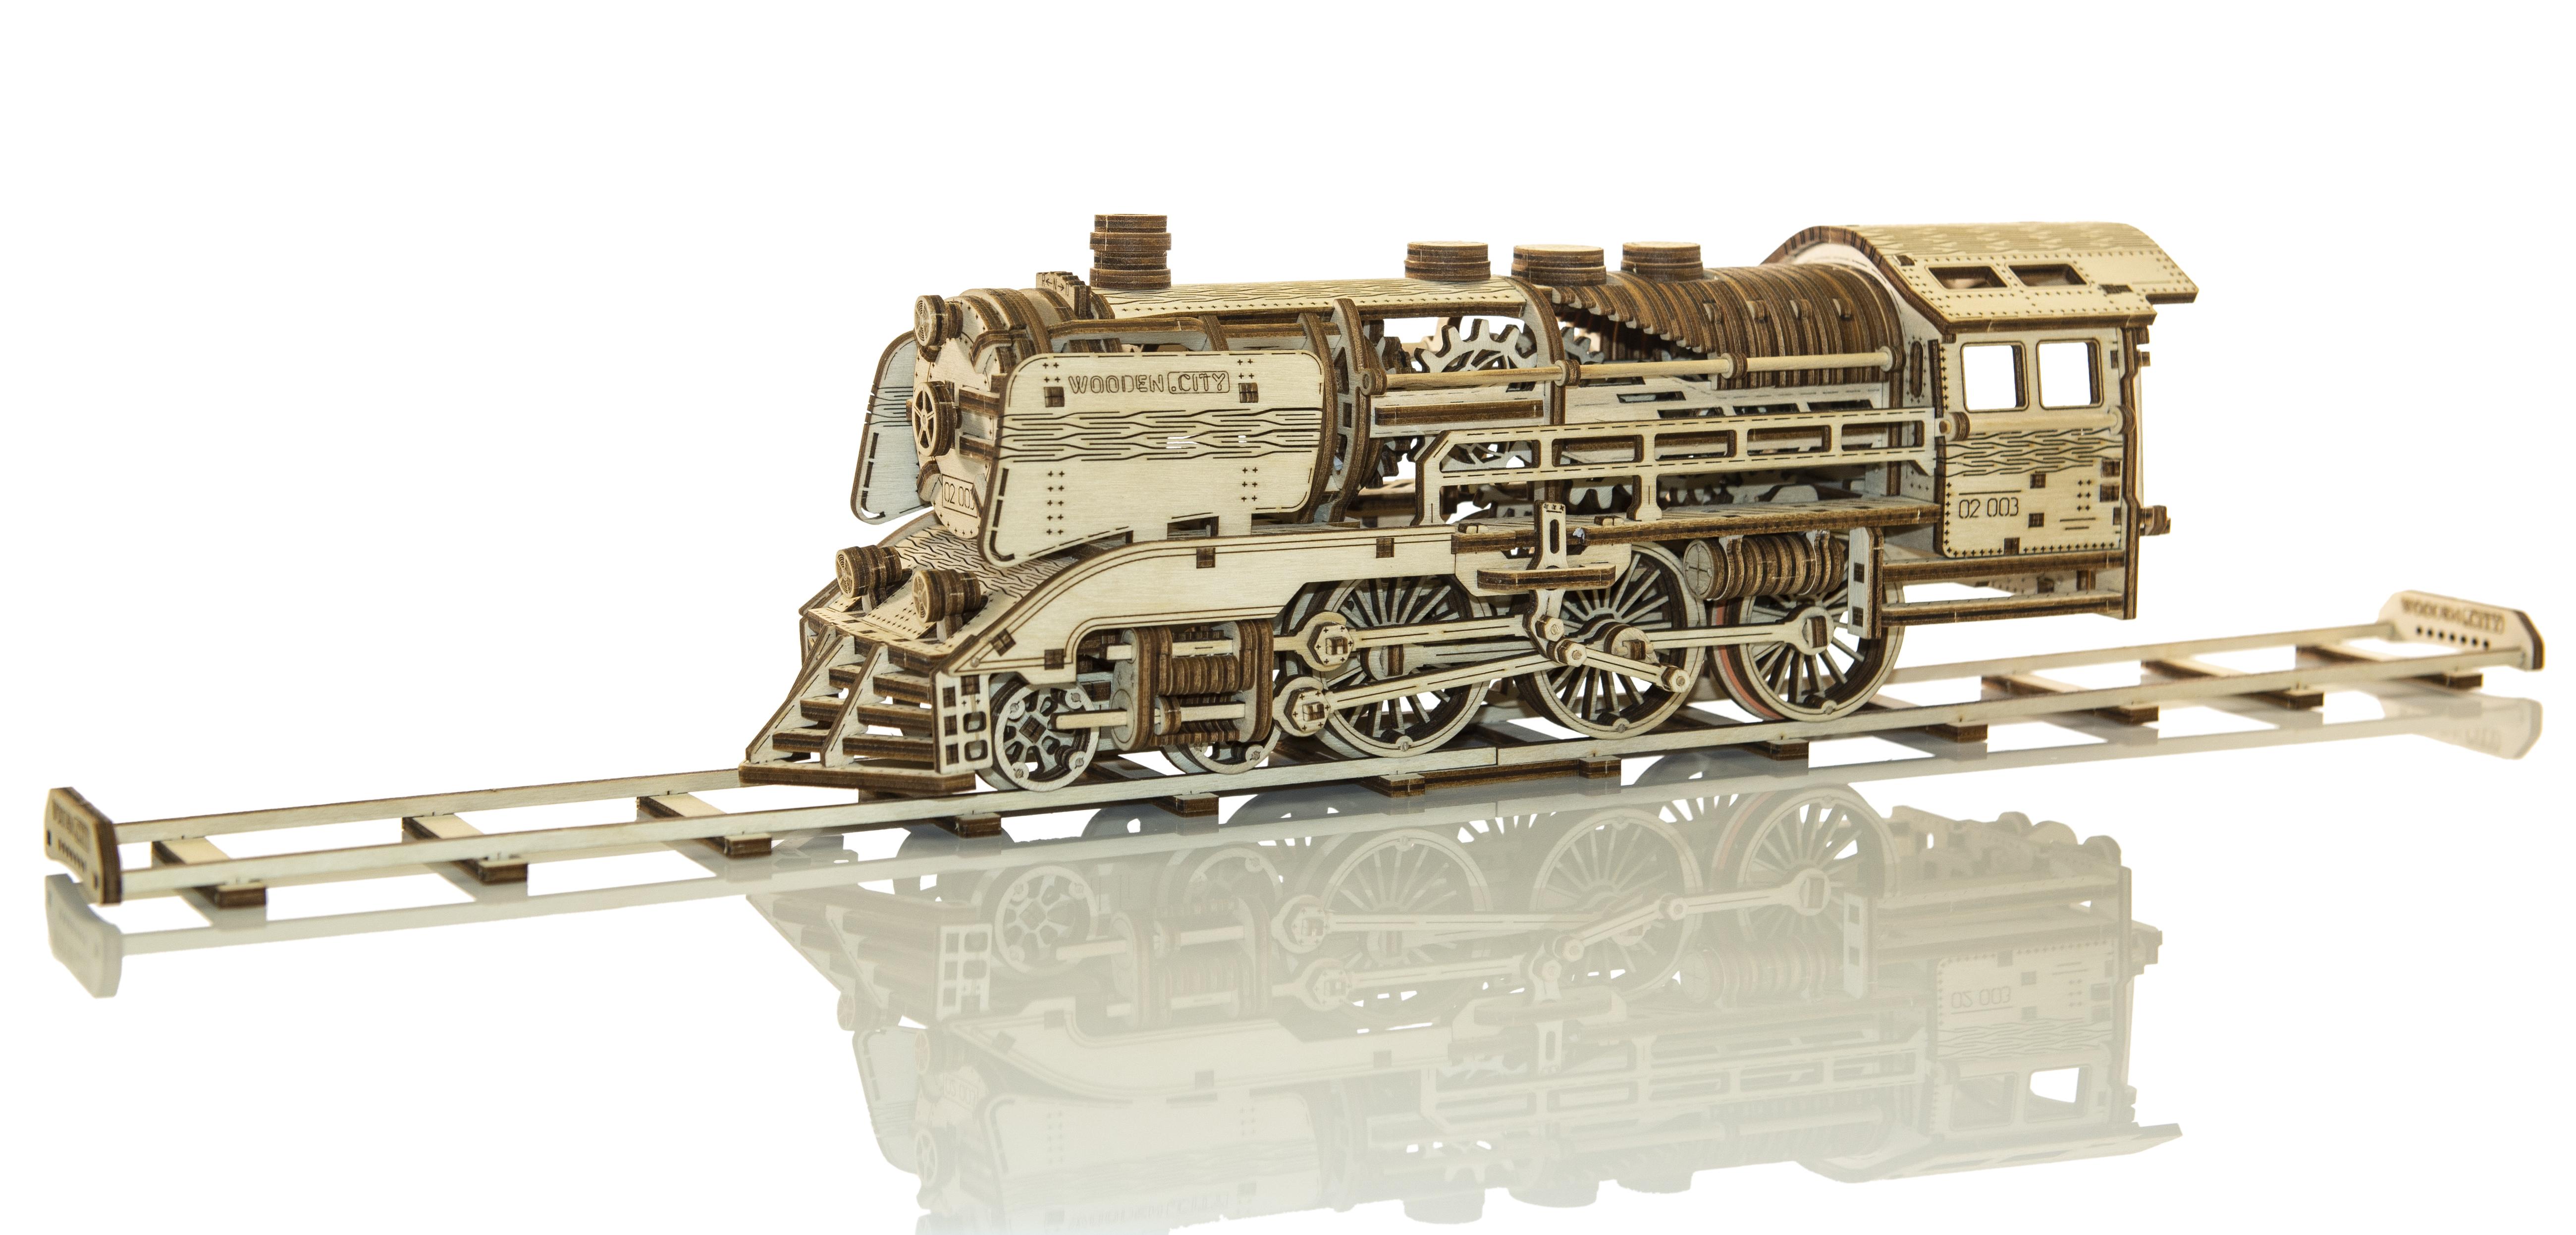 Woodencity Wr323 Wooden Express Locomotive Train Plus Tender Rails Motion Model Kit